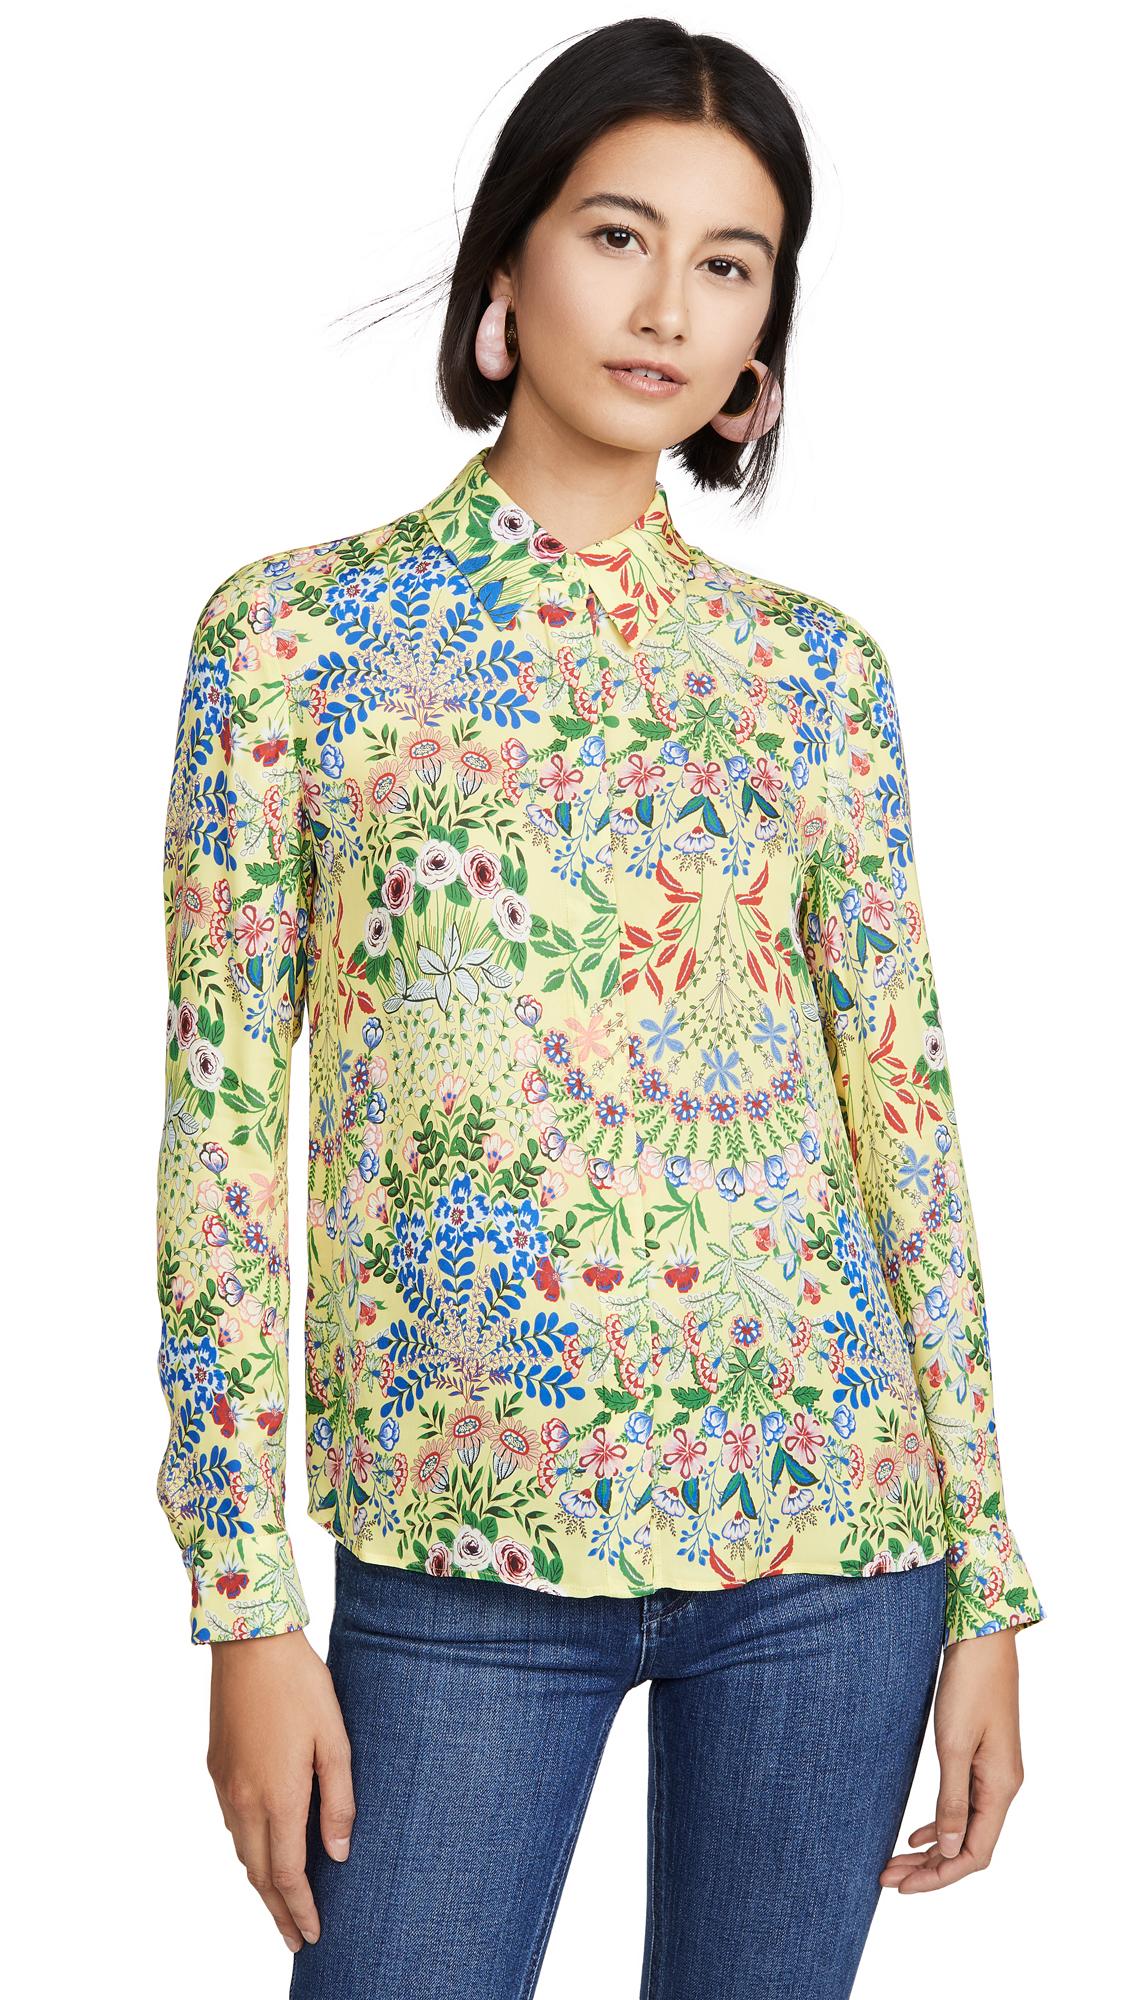 alice + olivia Willa Button Down Shirt – 50% Off Sale